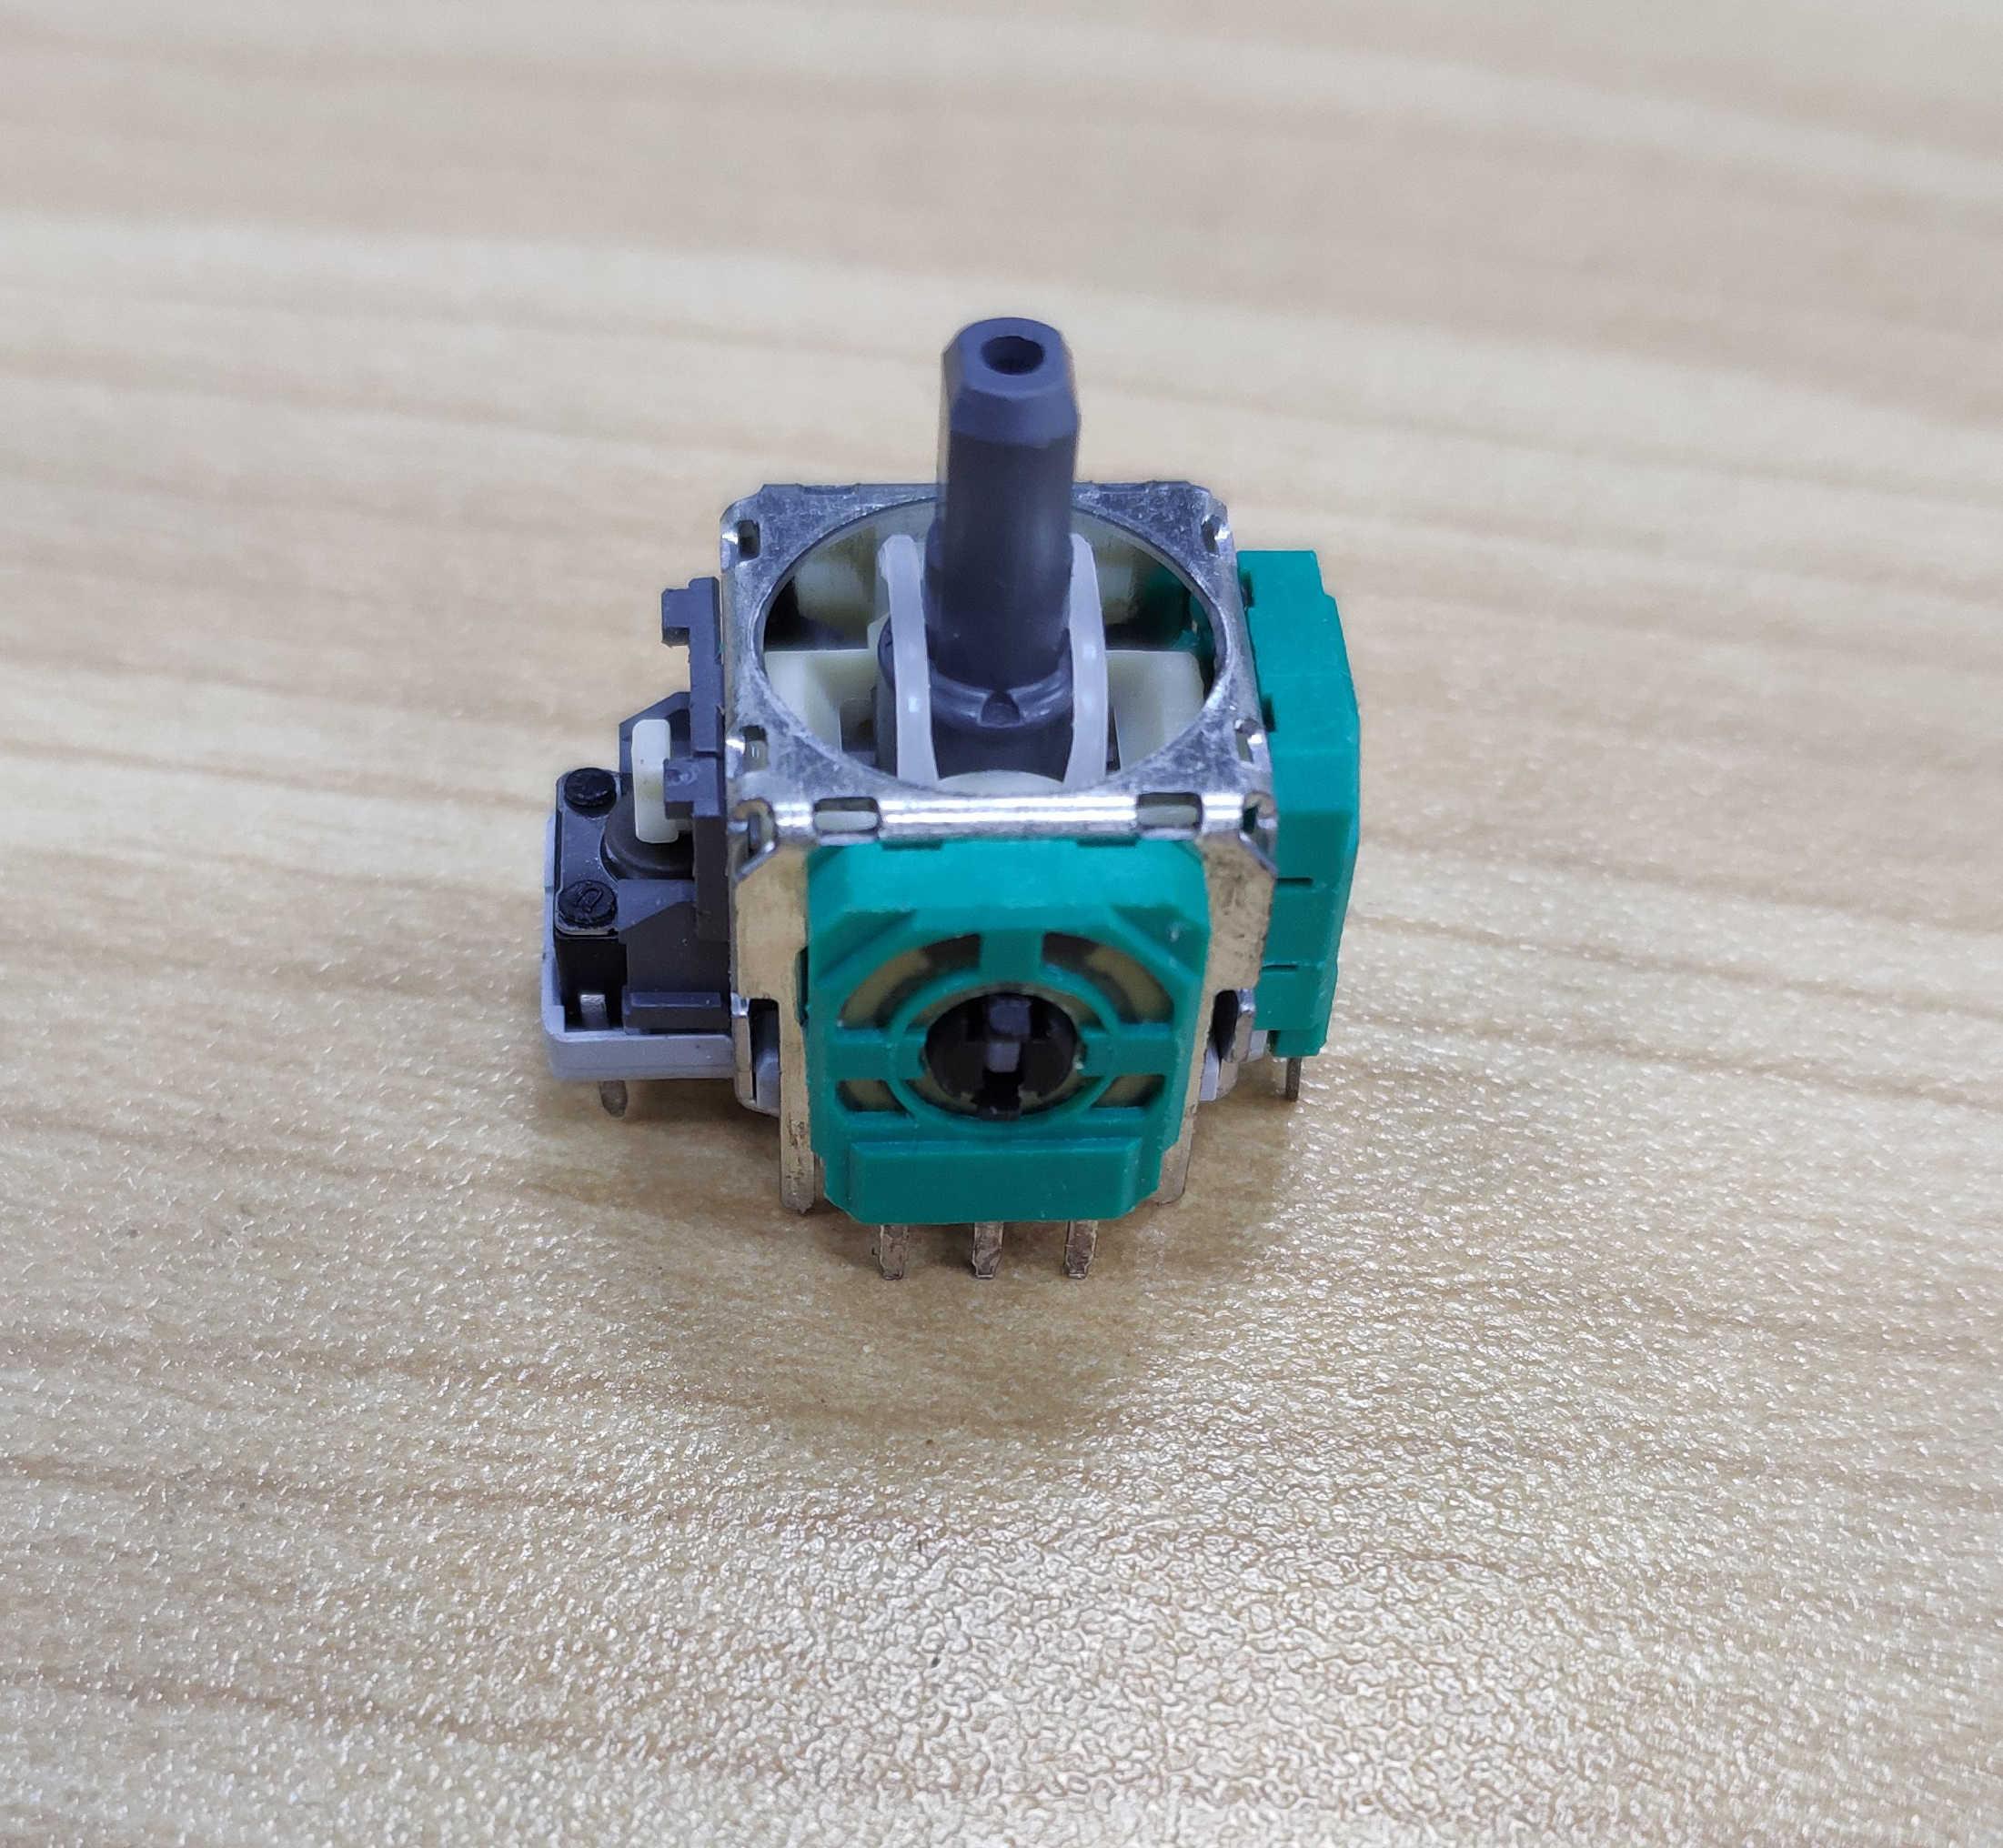 2pcs di Ricambio Originale parte 3D Joystick Analogico Thumb Stick Joystick Modulo Sensore Per Nintend Interruttore NS Pro controller joypad